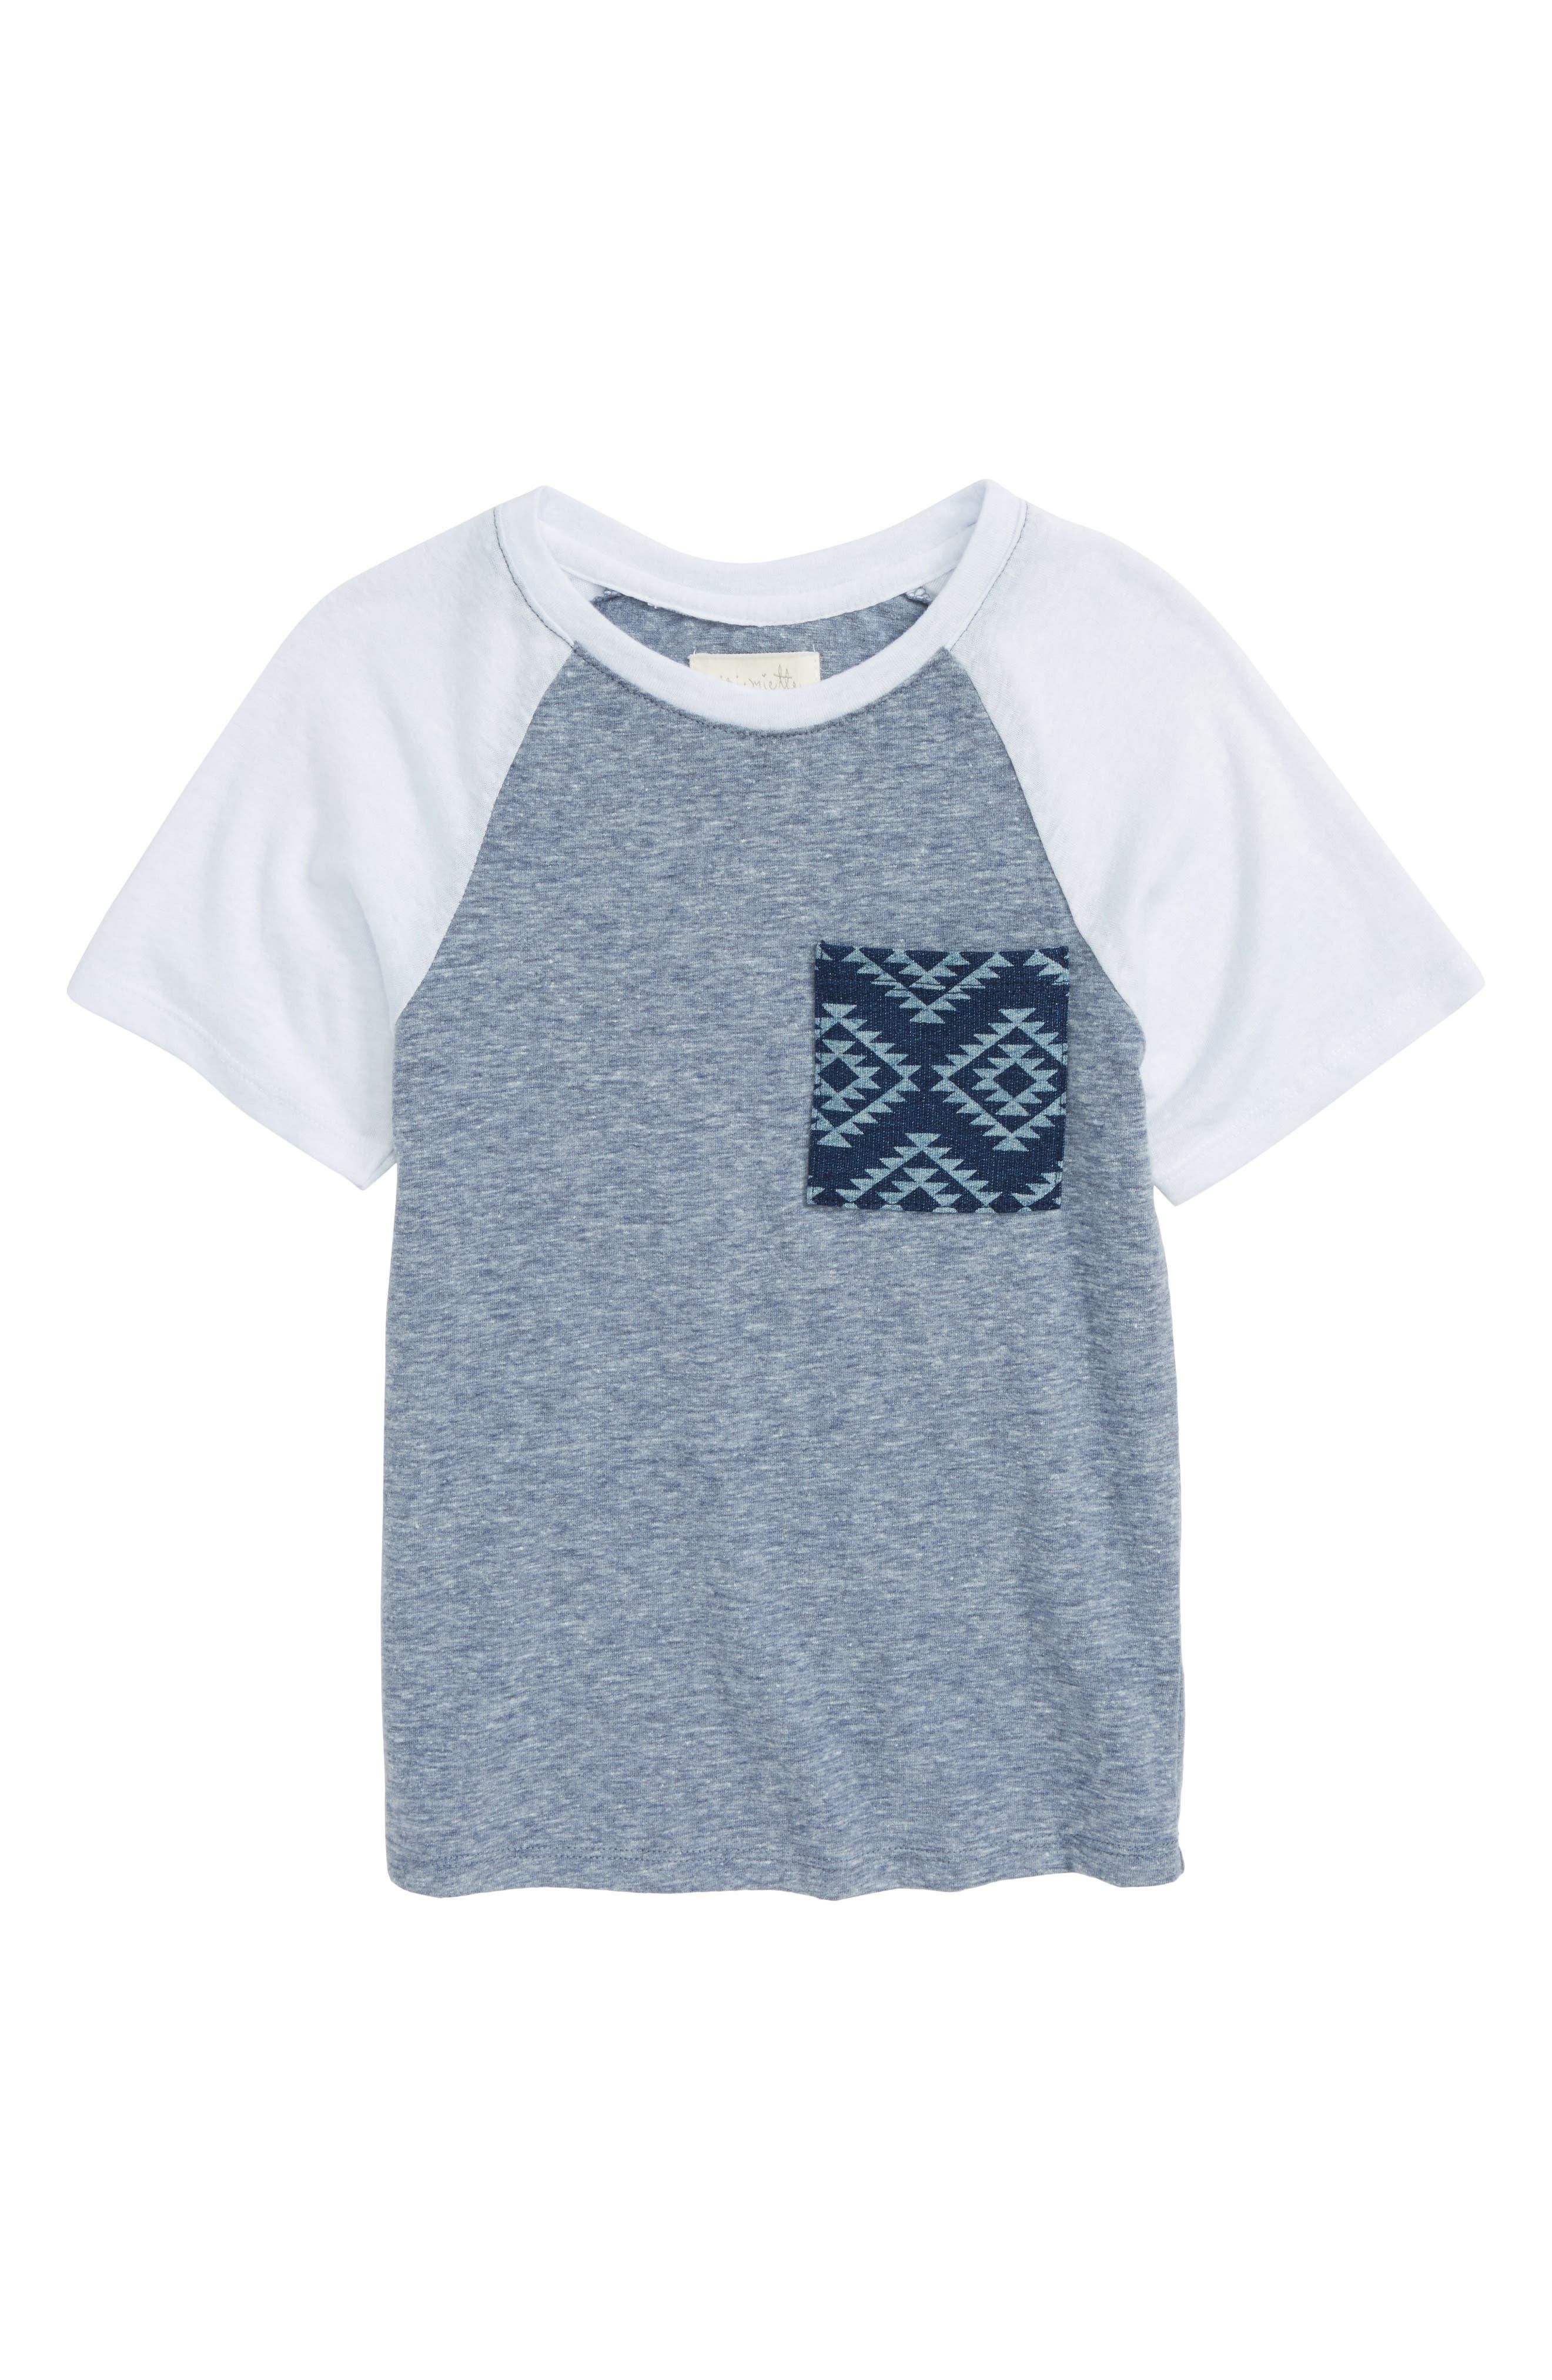 Miki Miette Sydney Pocket T-Shirt (Toddler Boys, Little Boys & Big Boys)